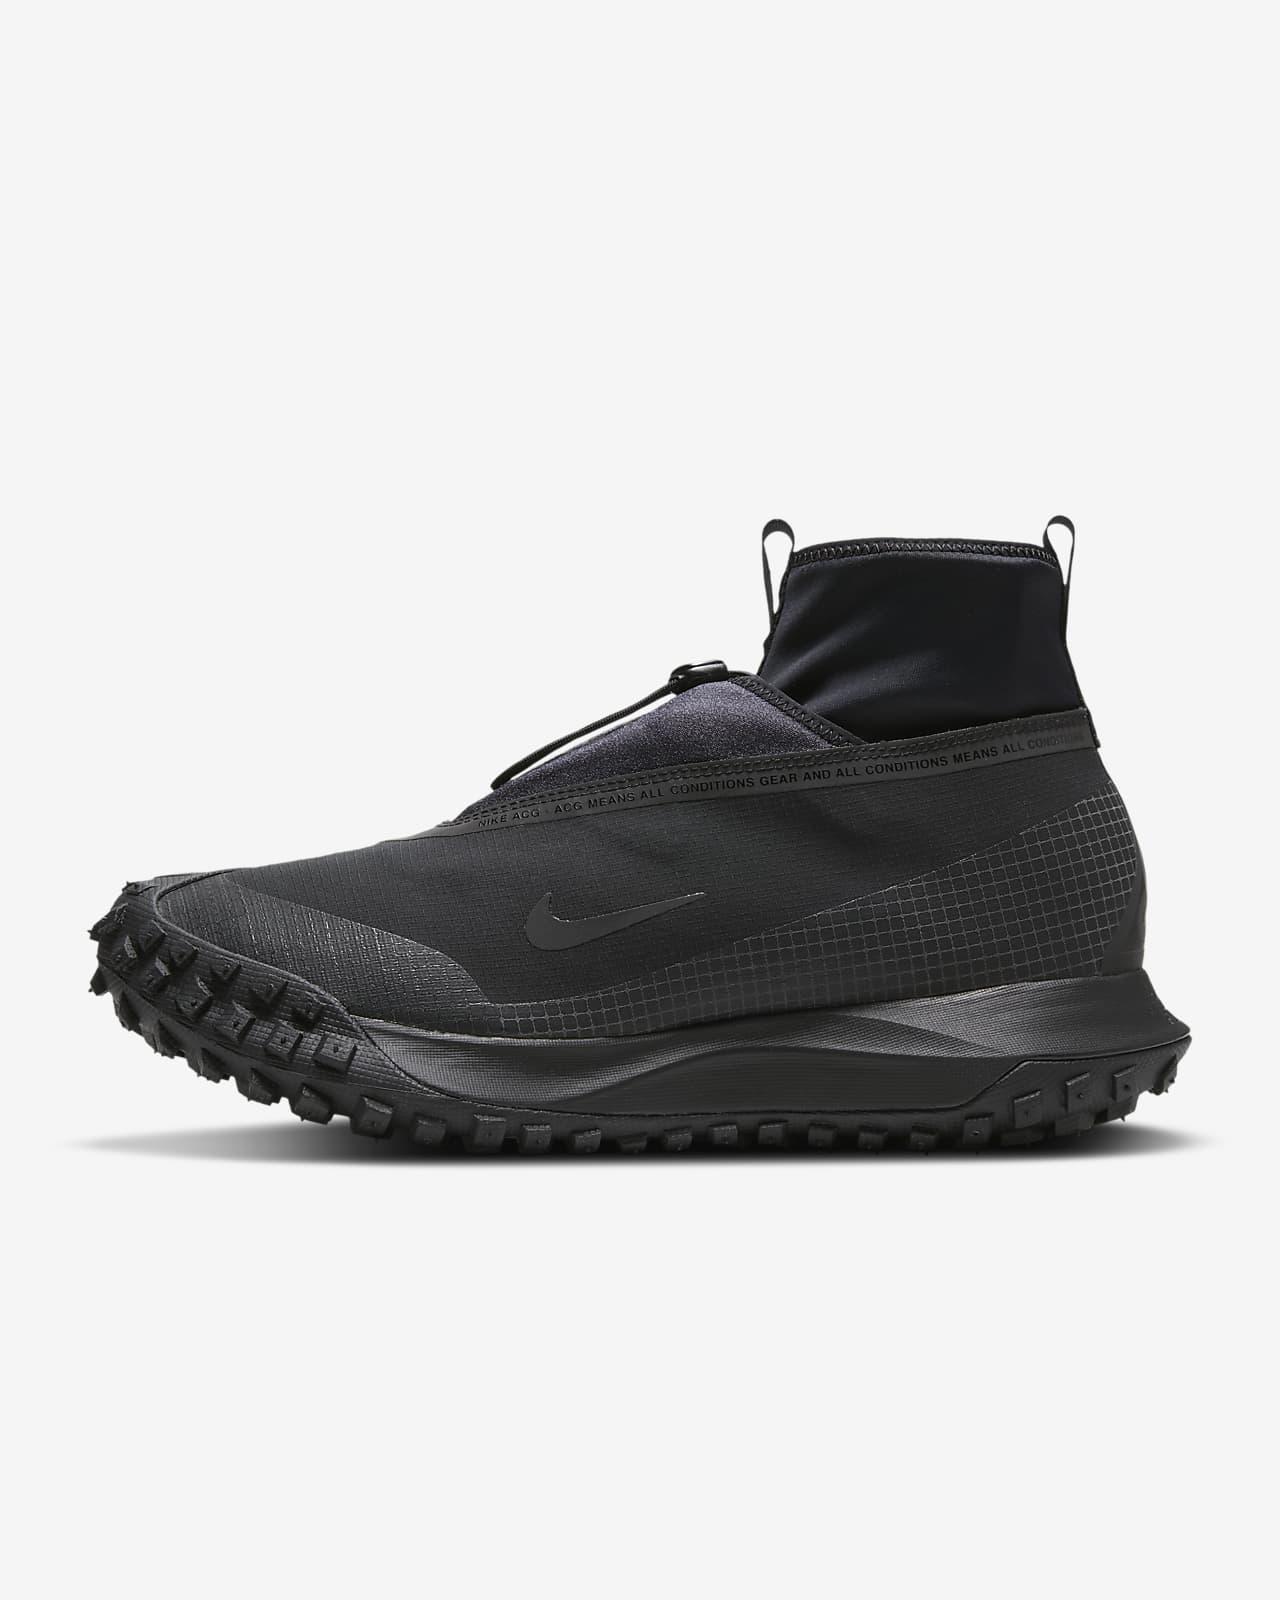 nike waterproof hiking boots